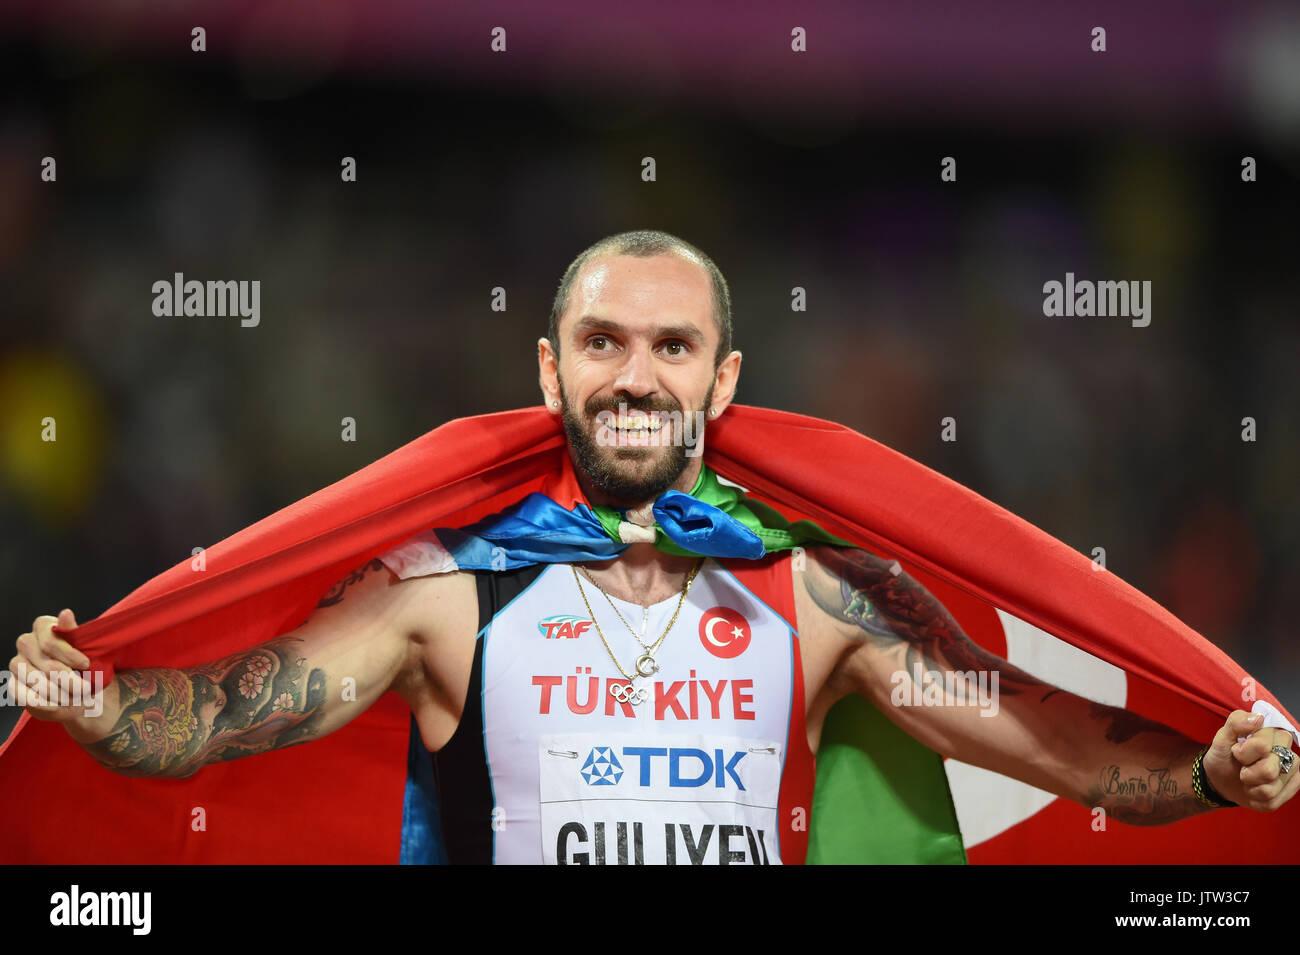 London, UK. 10th Aug, 2017. Ramil Guliyev, Turkey, winning mens 200 meter final in London at the 2017 IAAF World Stock Photo